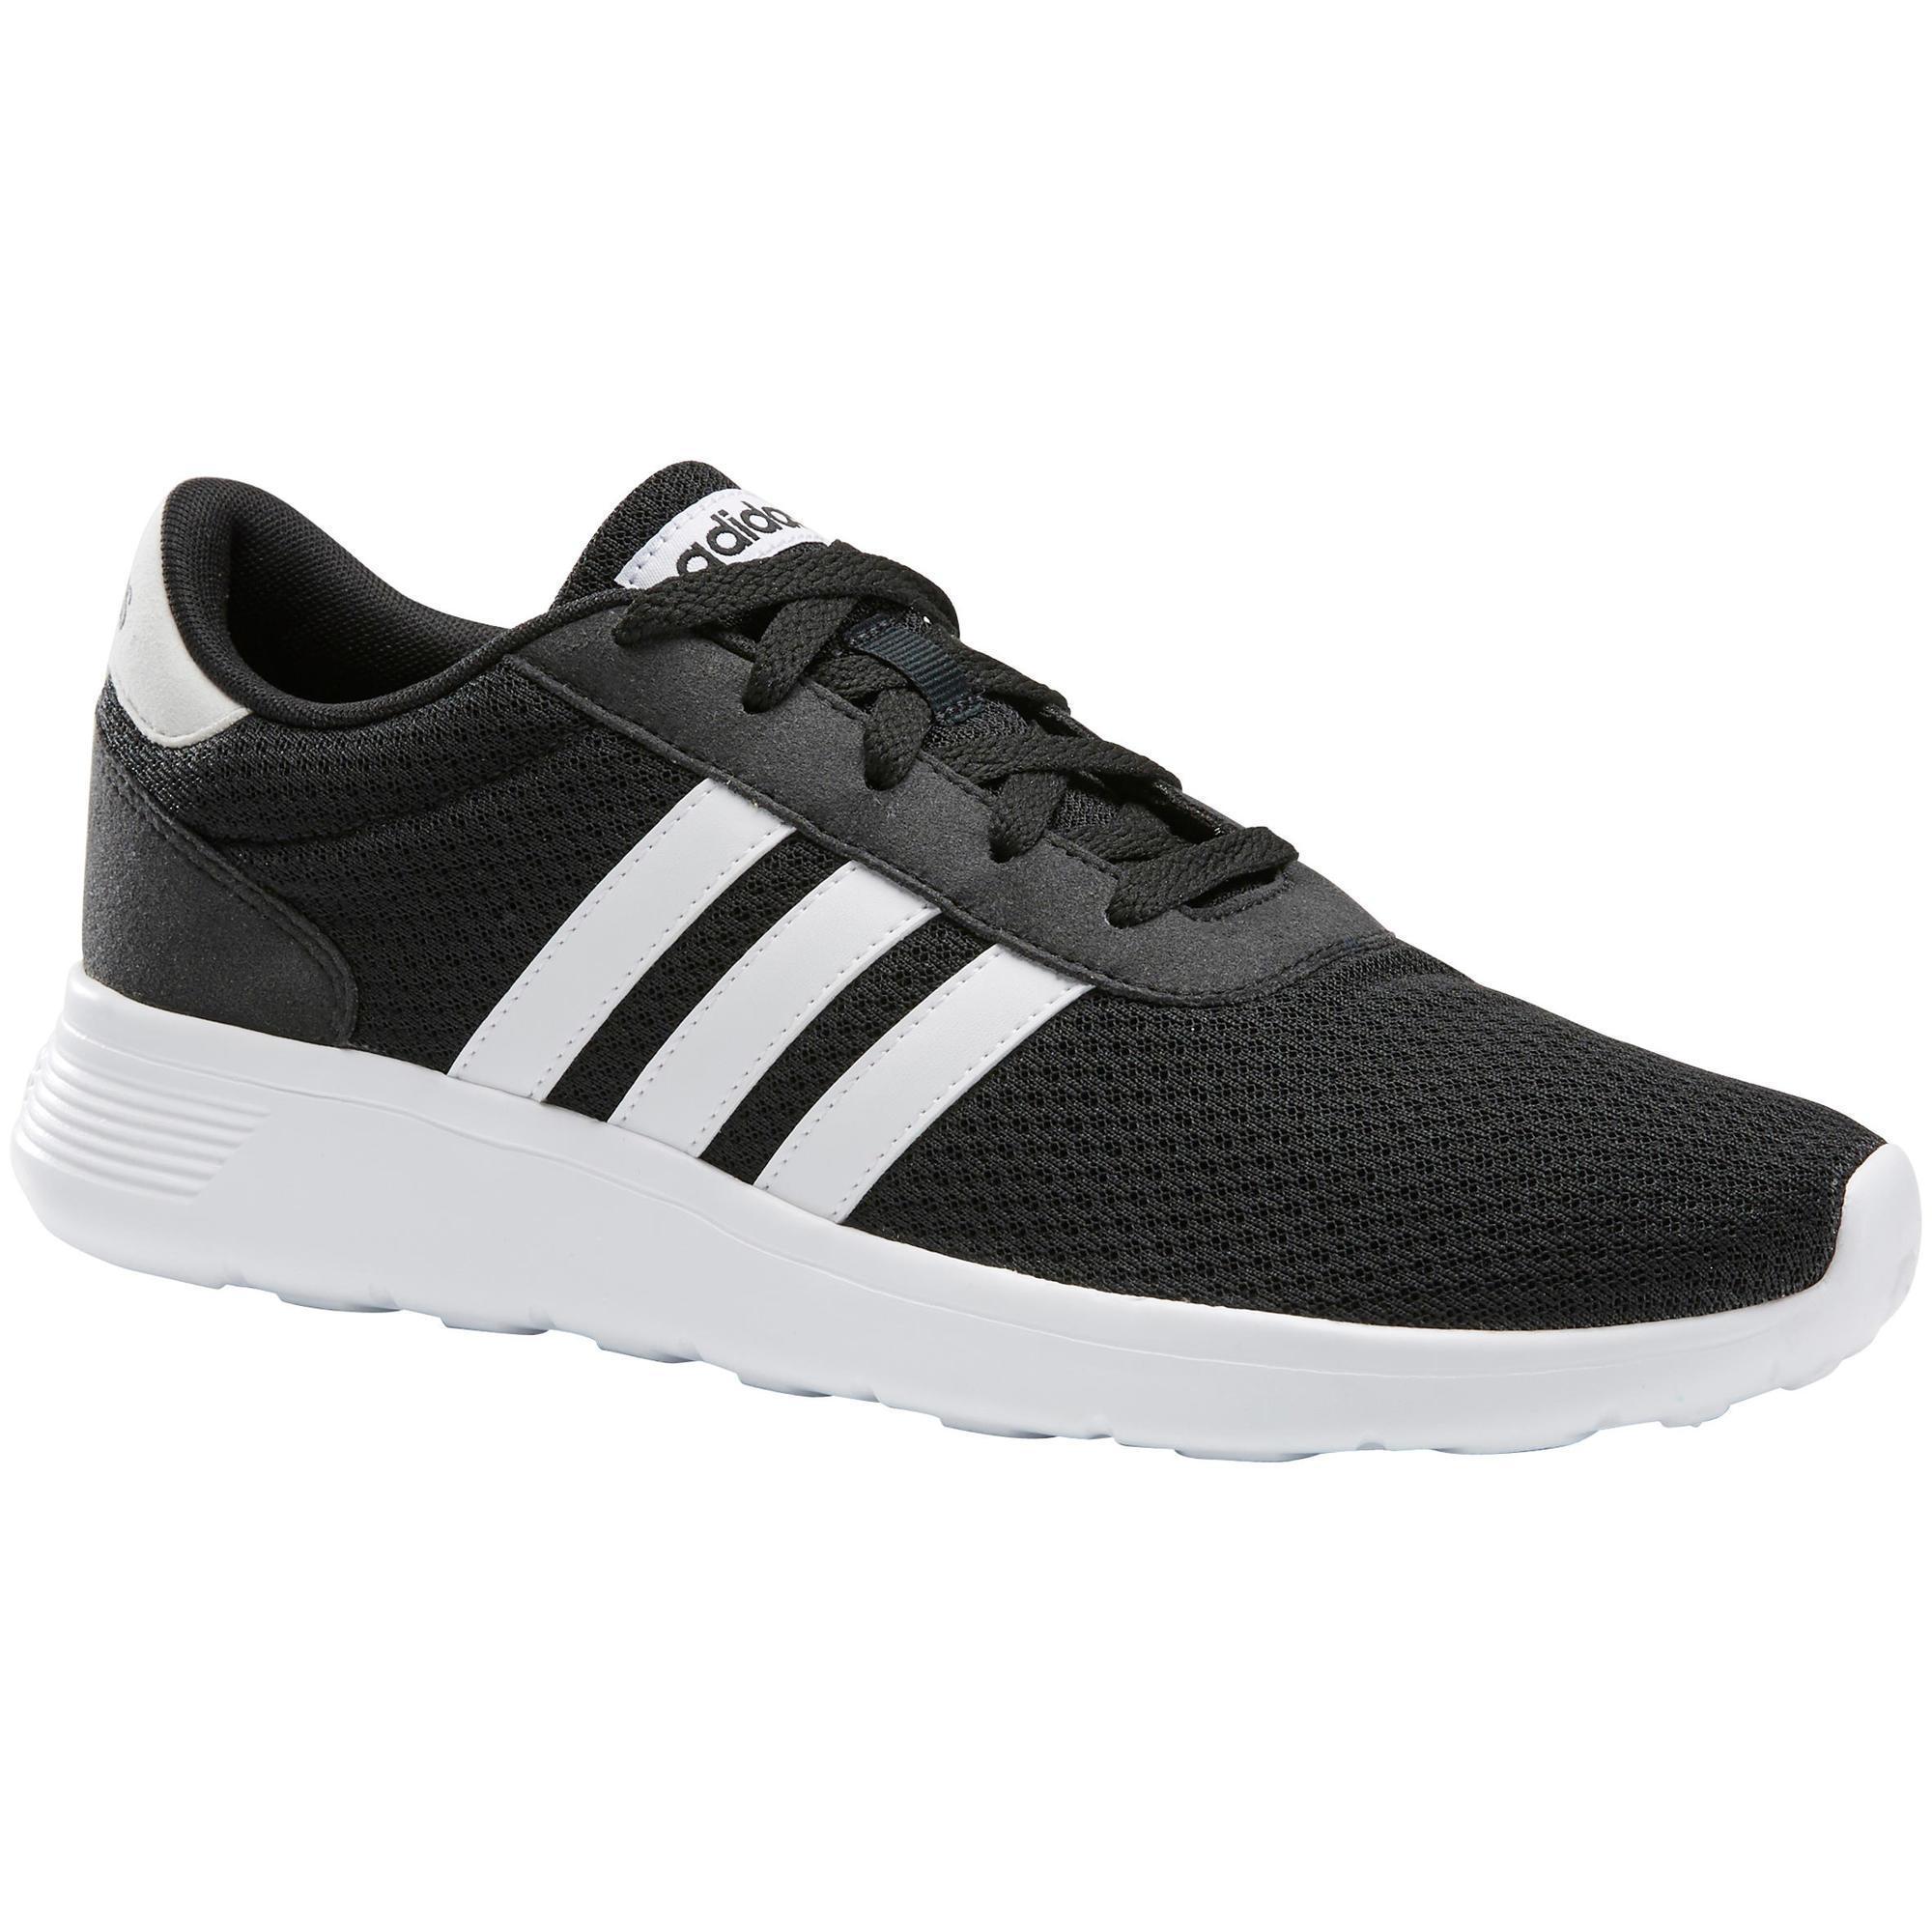 ad729e441 Adidas | Ropa | Zapatillas | en Decathlon